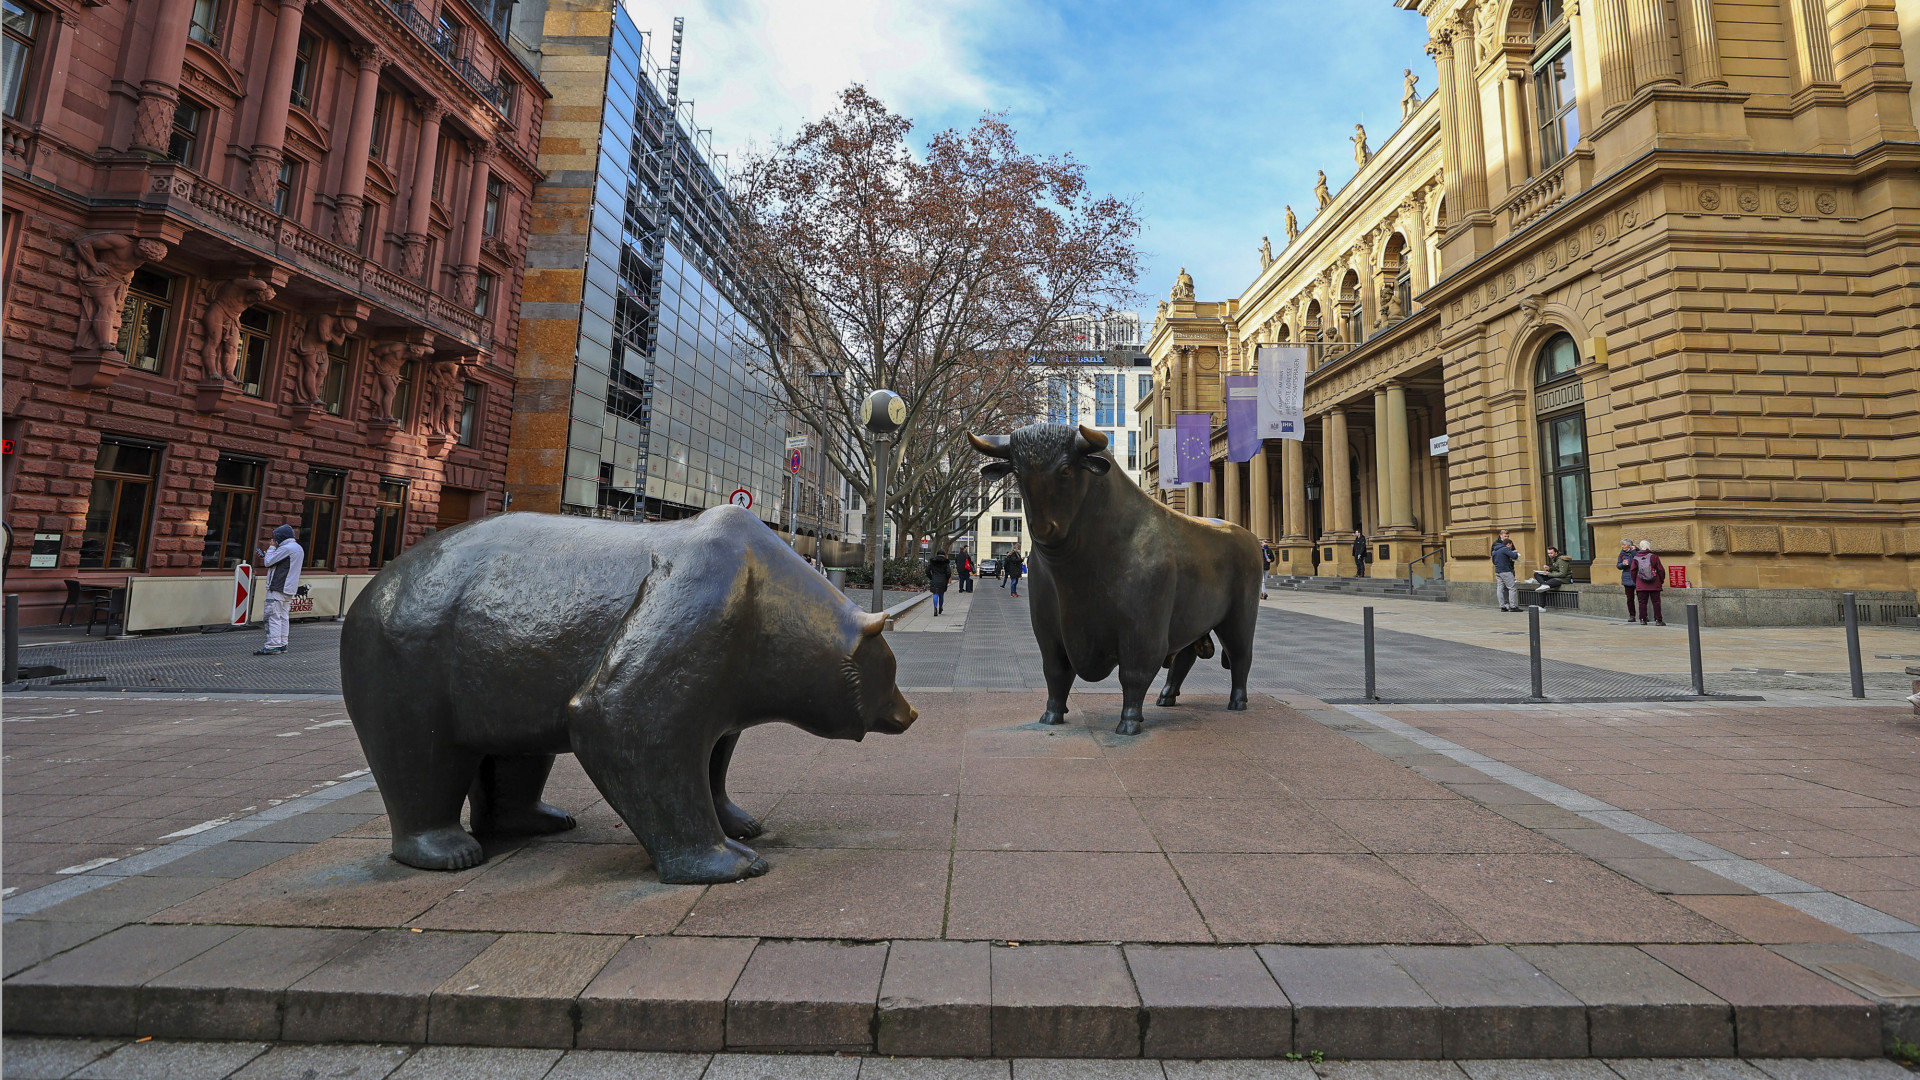 Dogecoin  latest dogecoin news Bitcoin rallies, oil falls, uncertainty in stock markets thumbnail